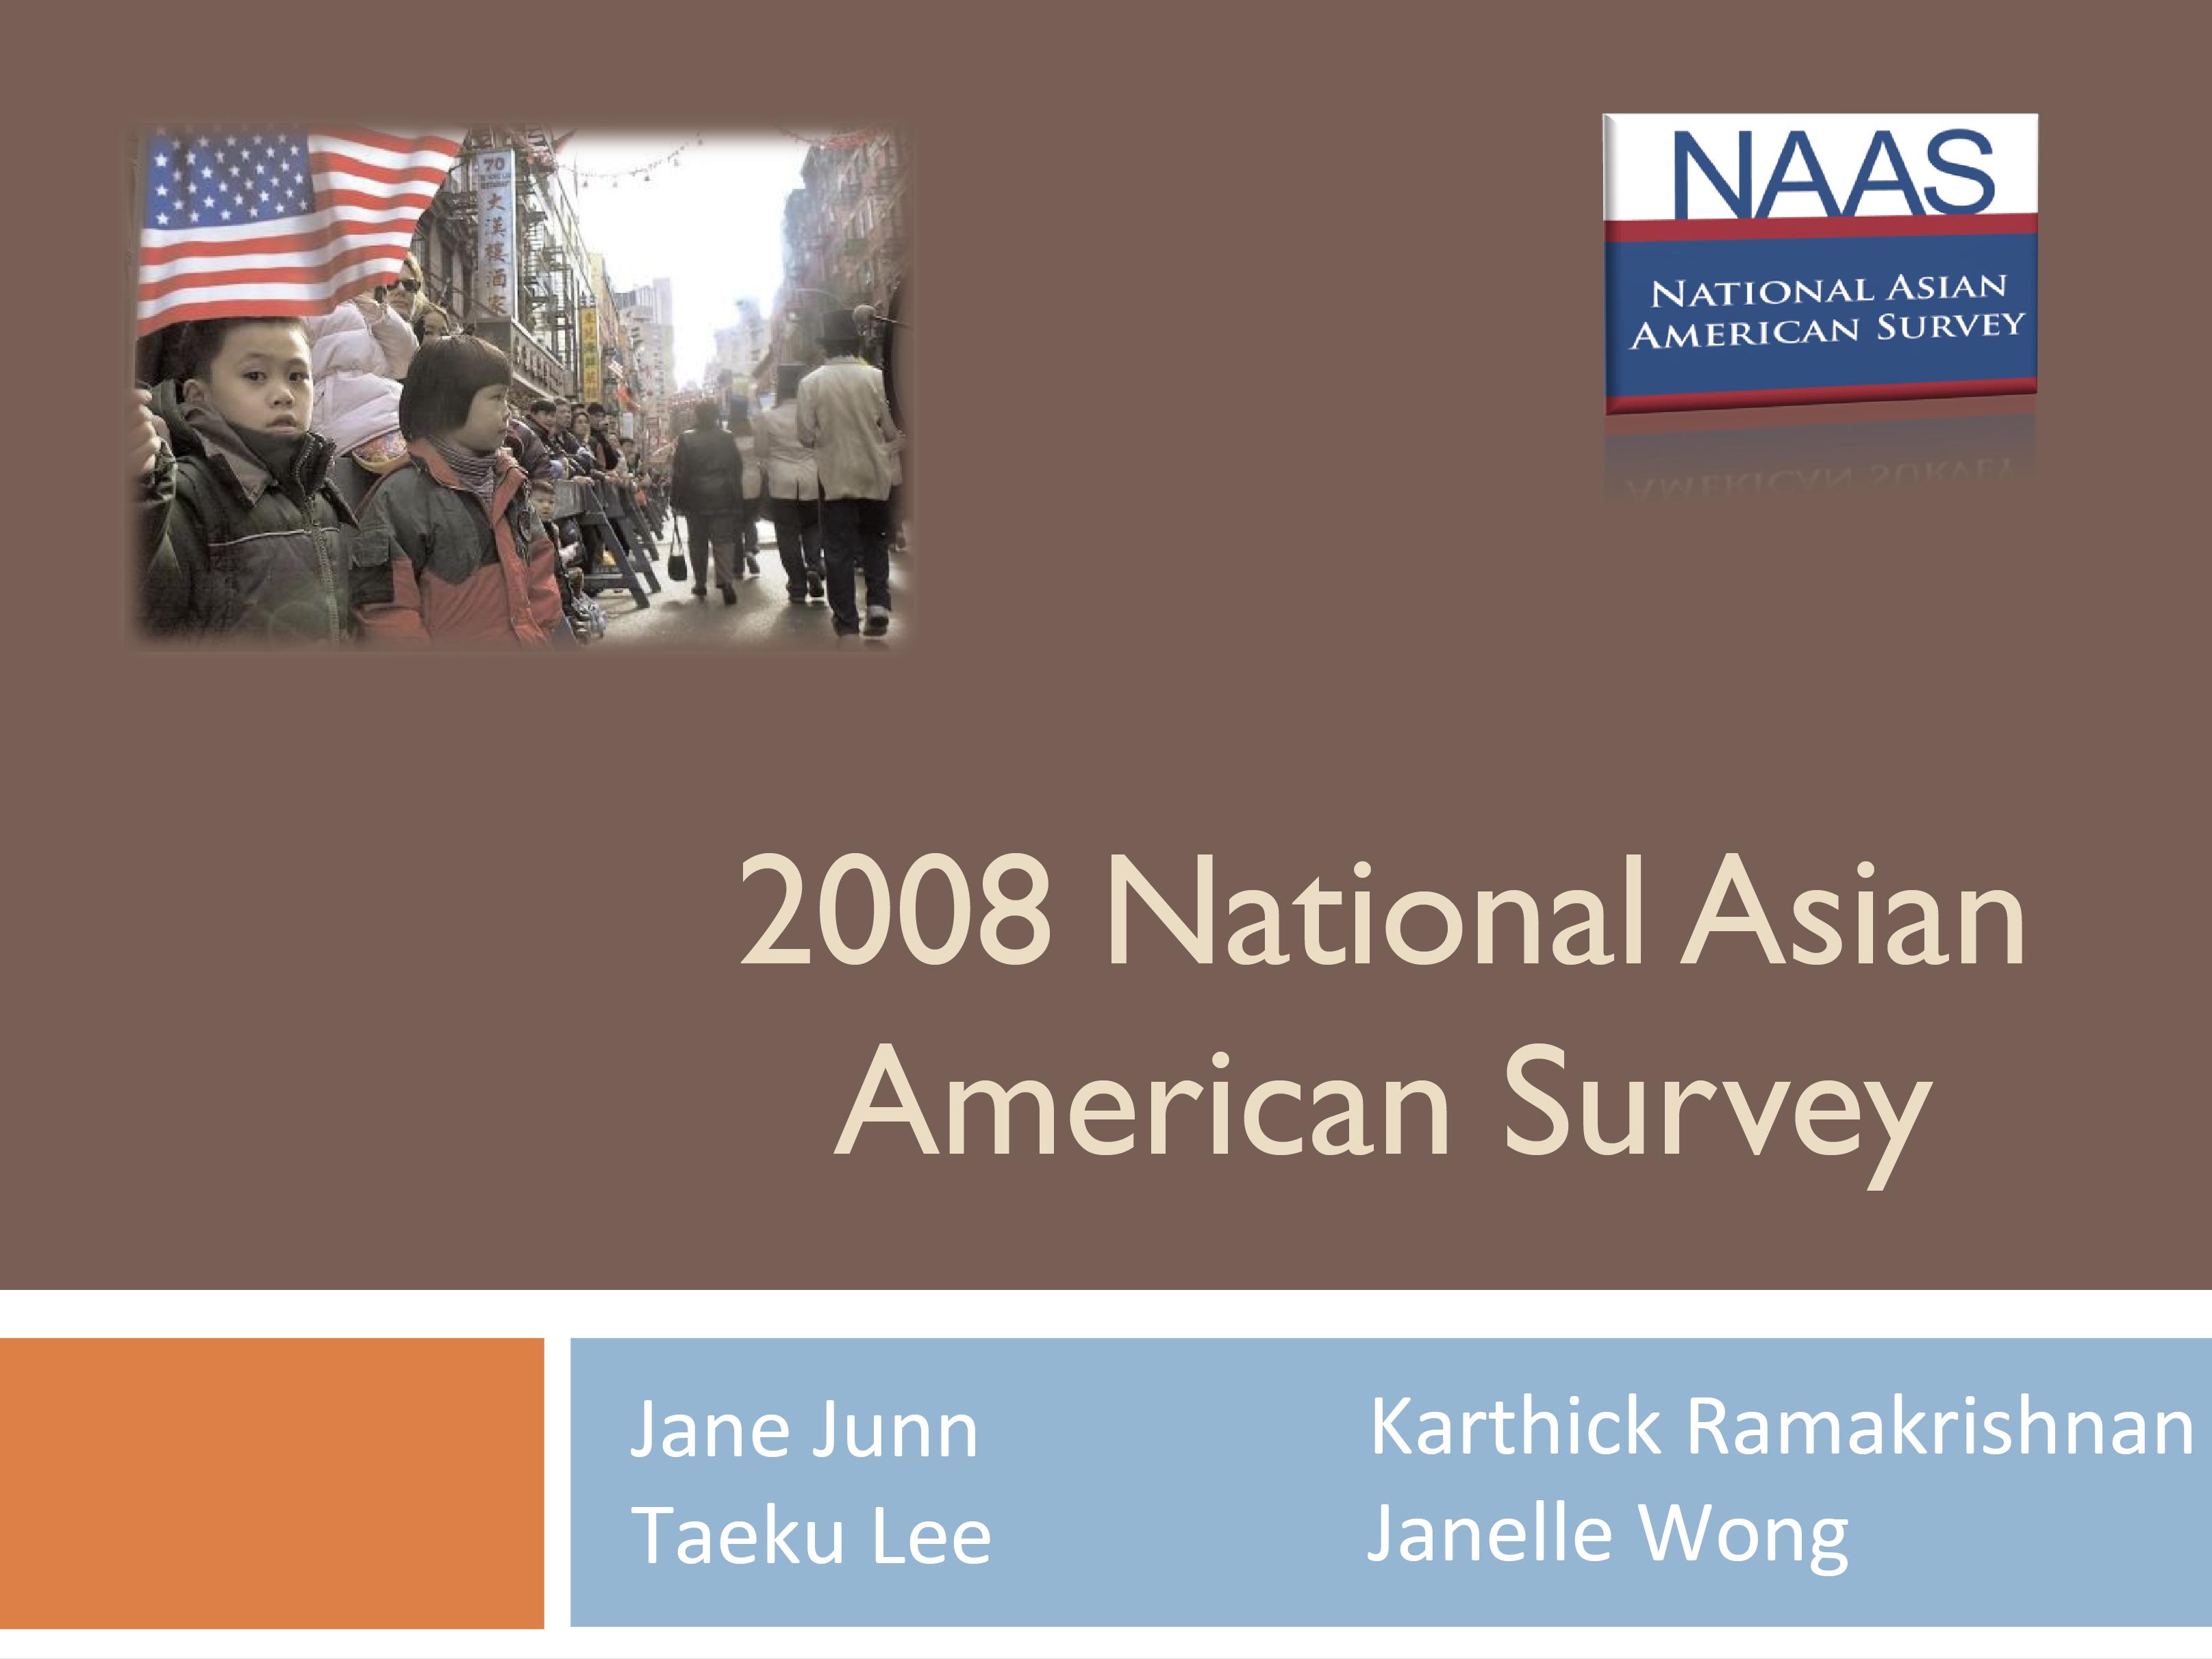 NAAS-nyc-presentation-2009